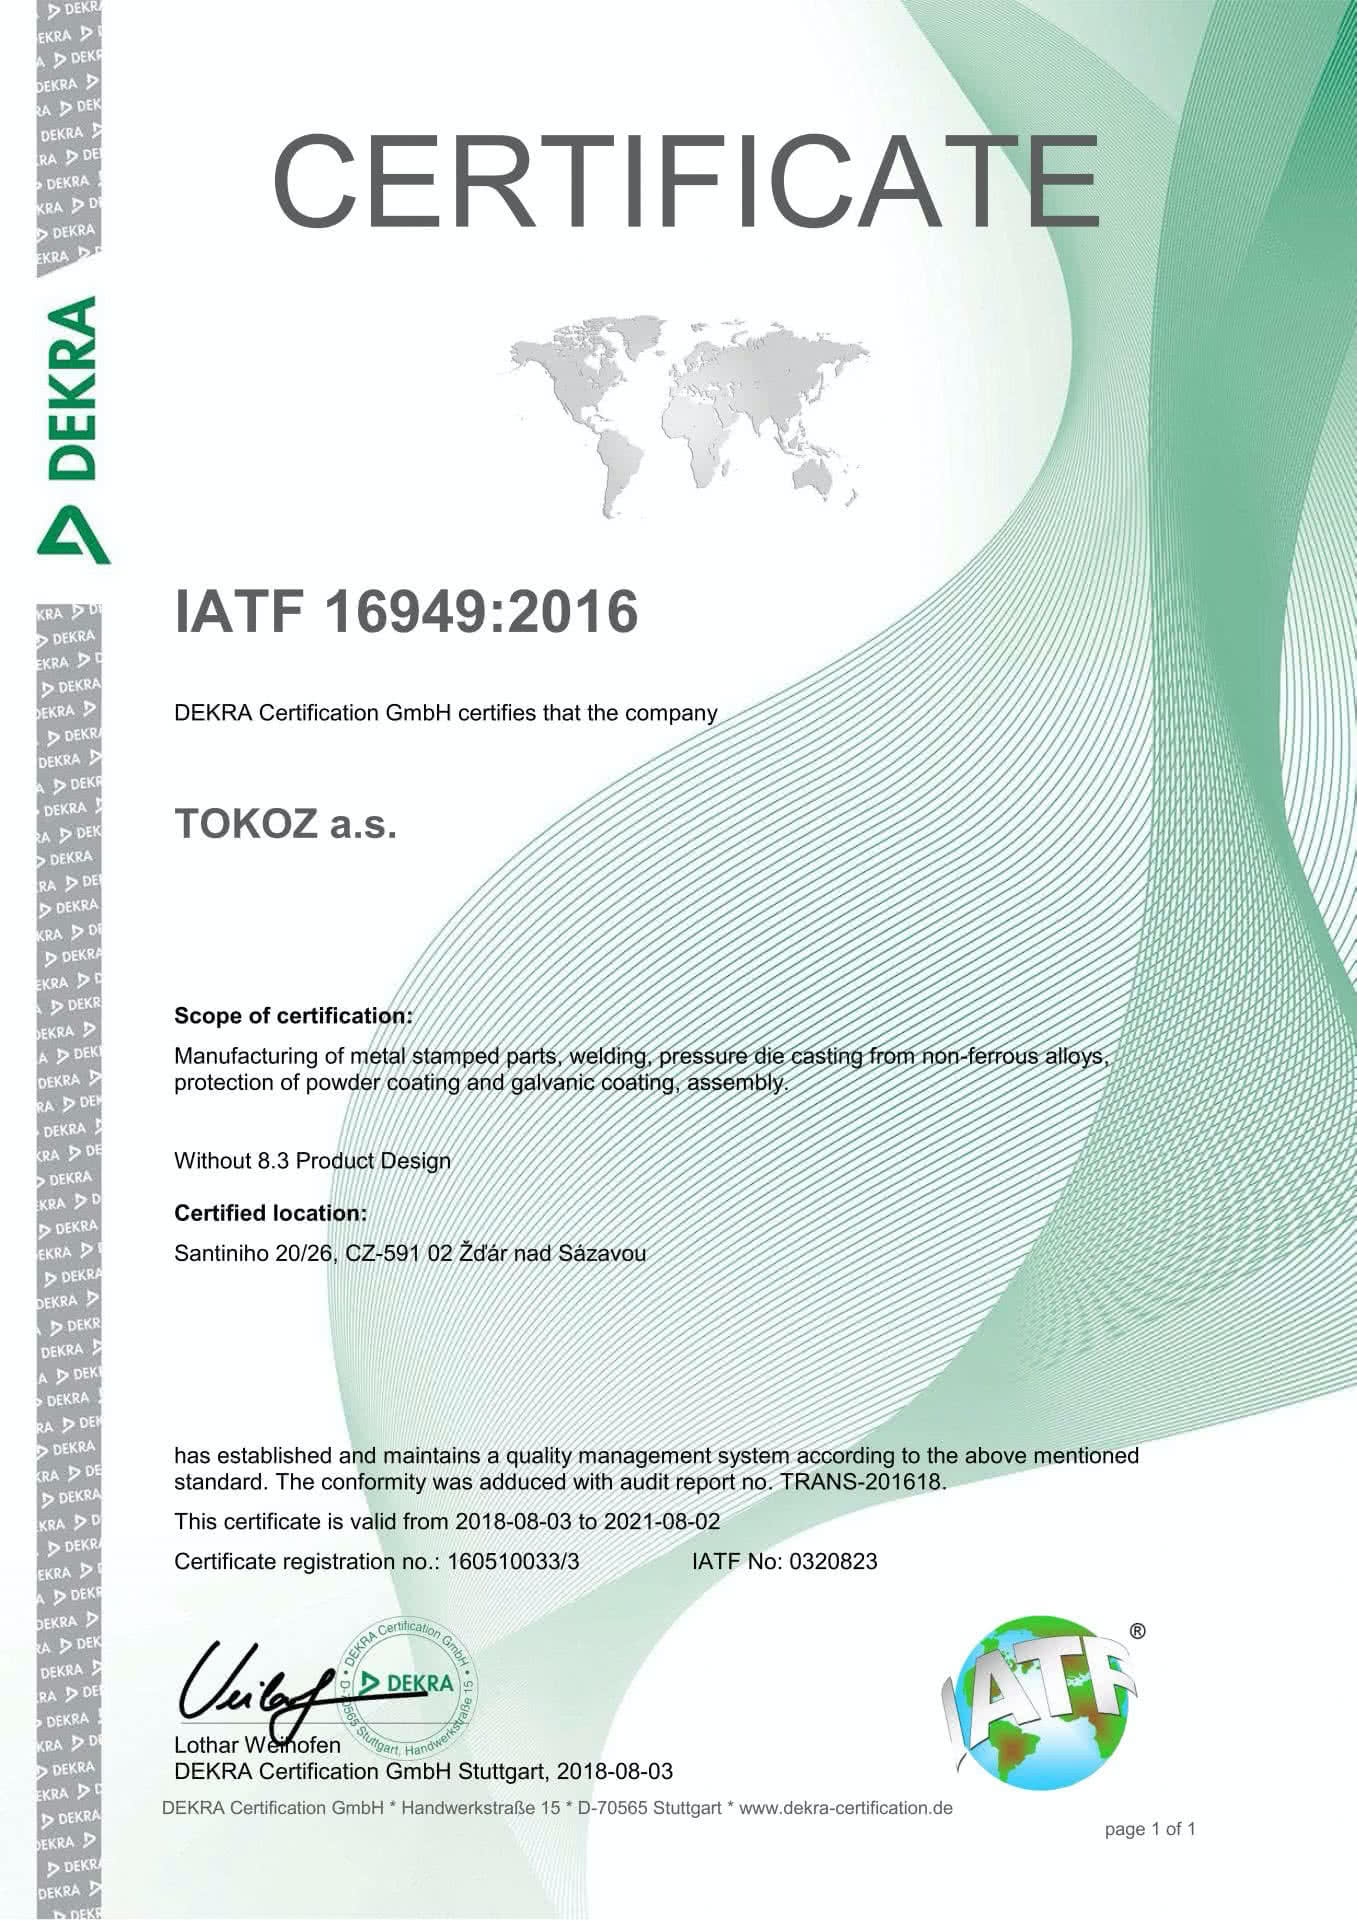 QMS_TOKOZ_IATF_16949-2016_EN_01